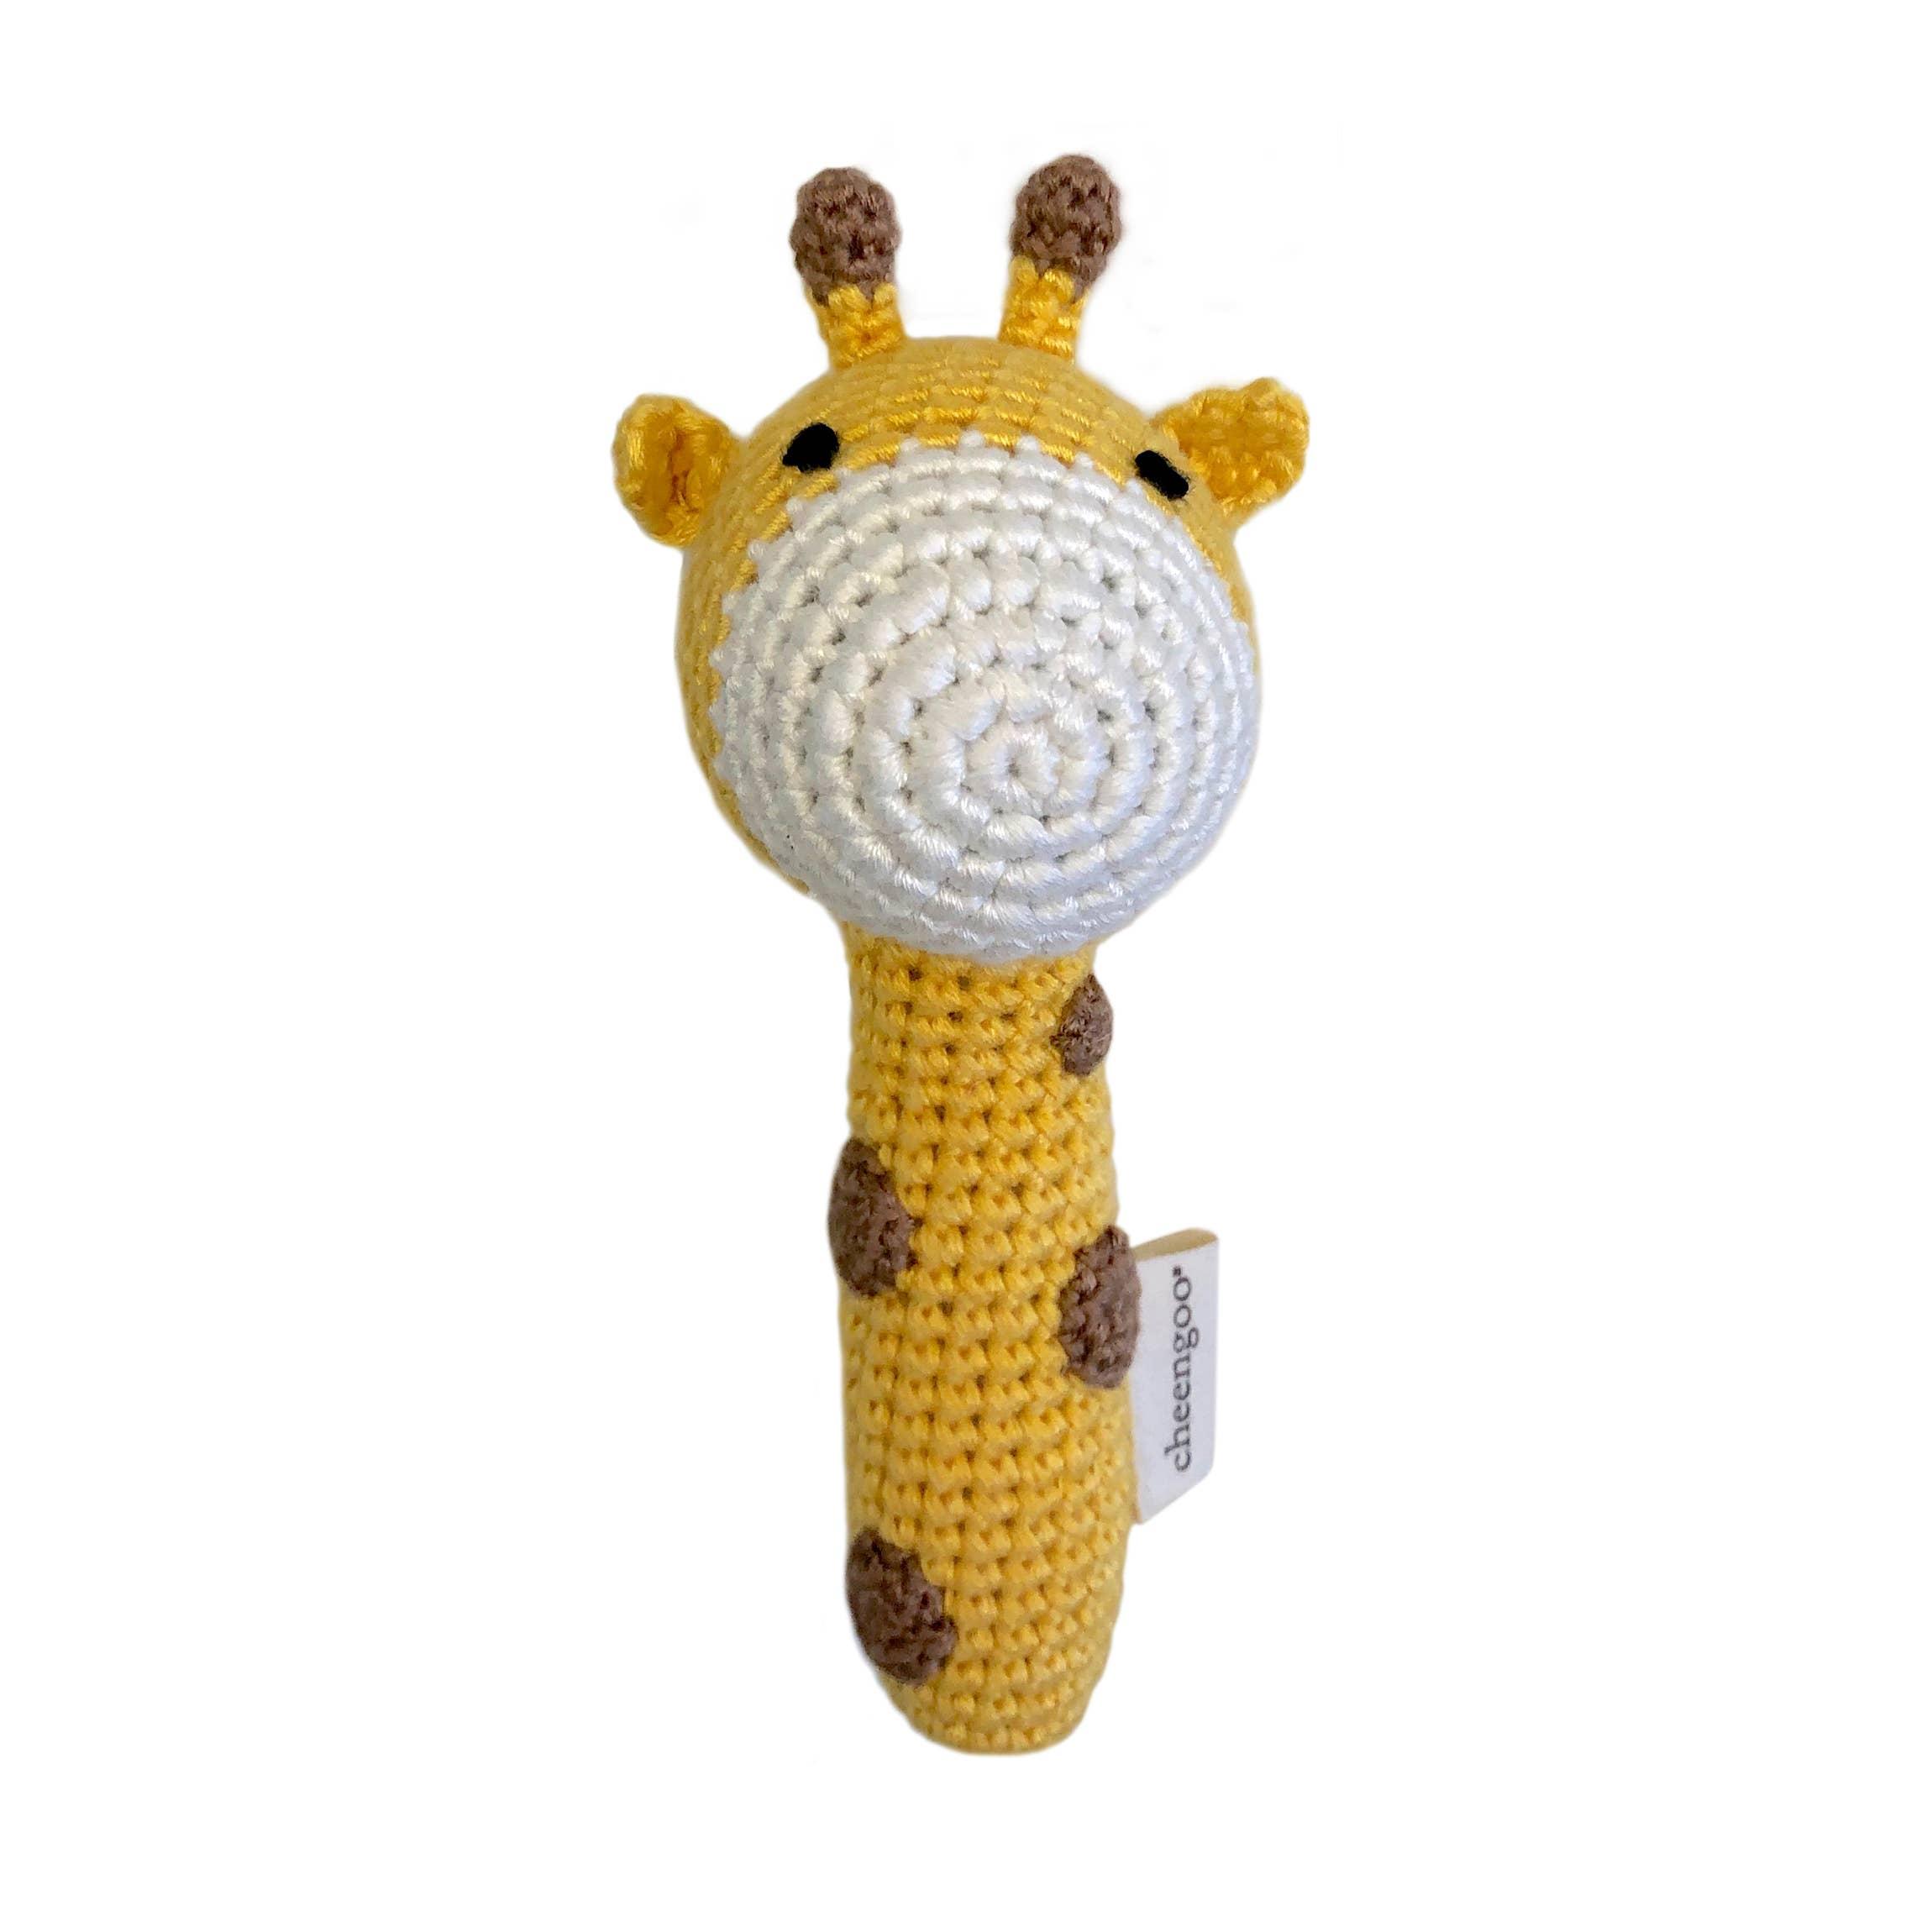 Cheengoo Organic Crocheted Stick Rattle Snowman